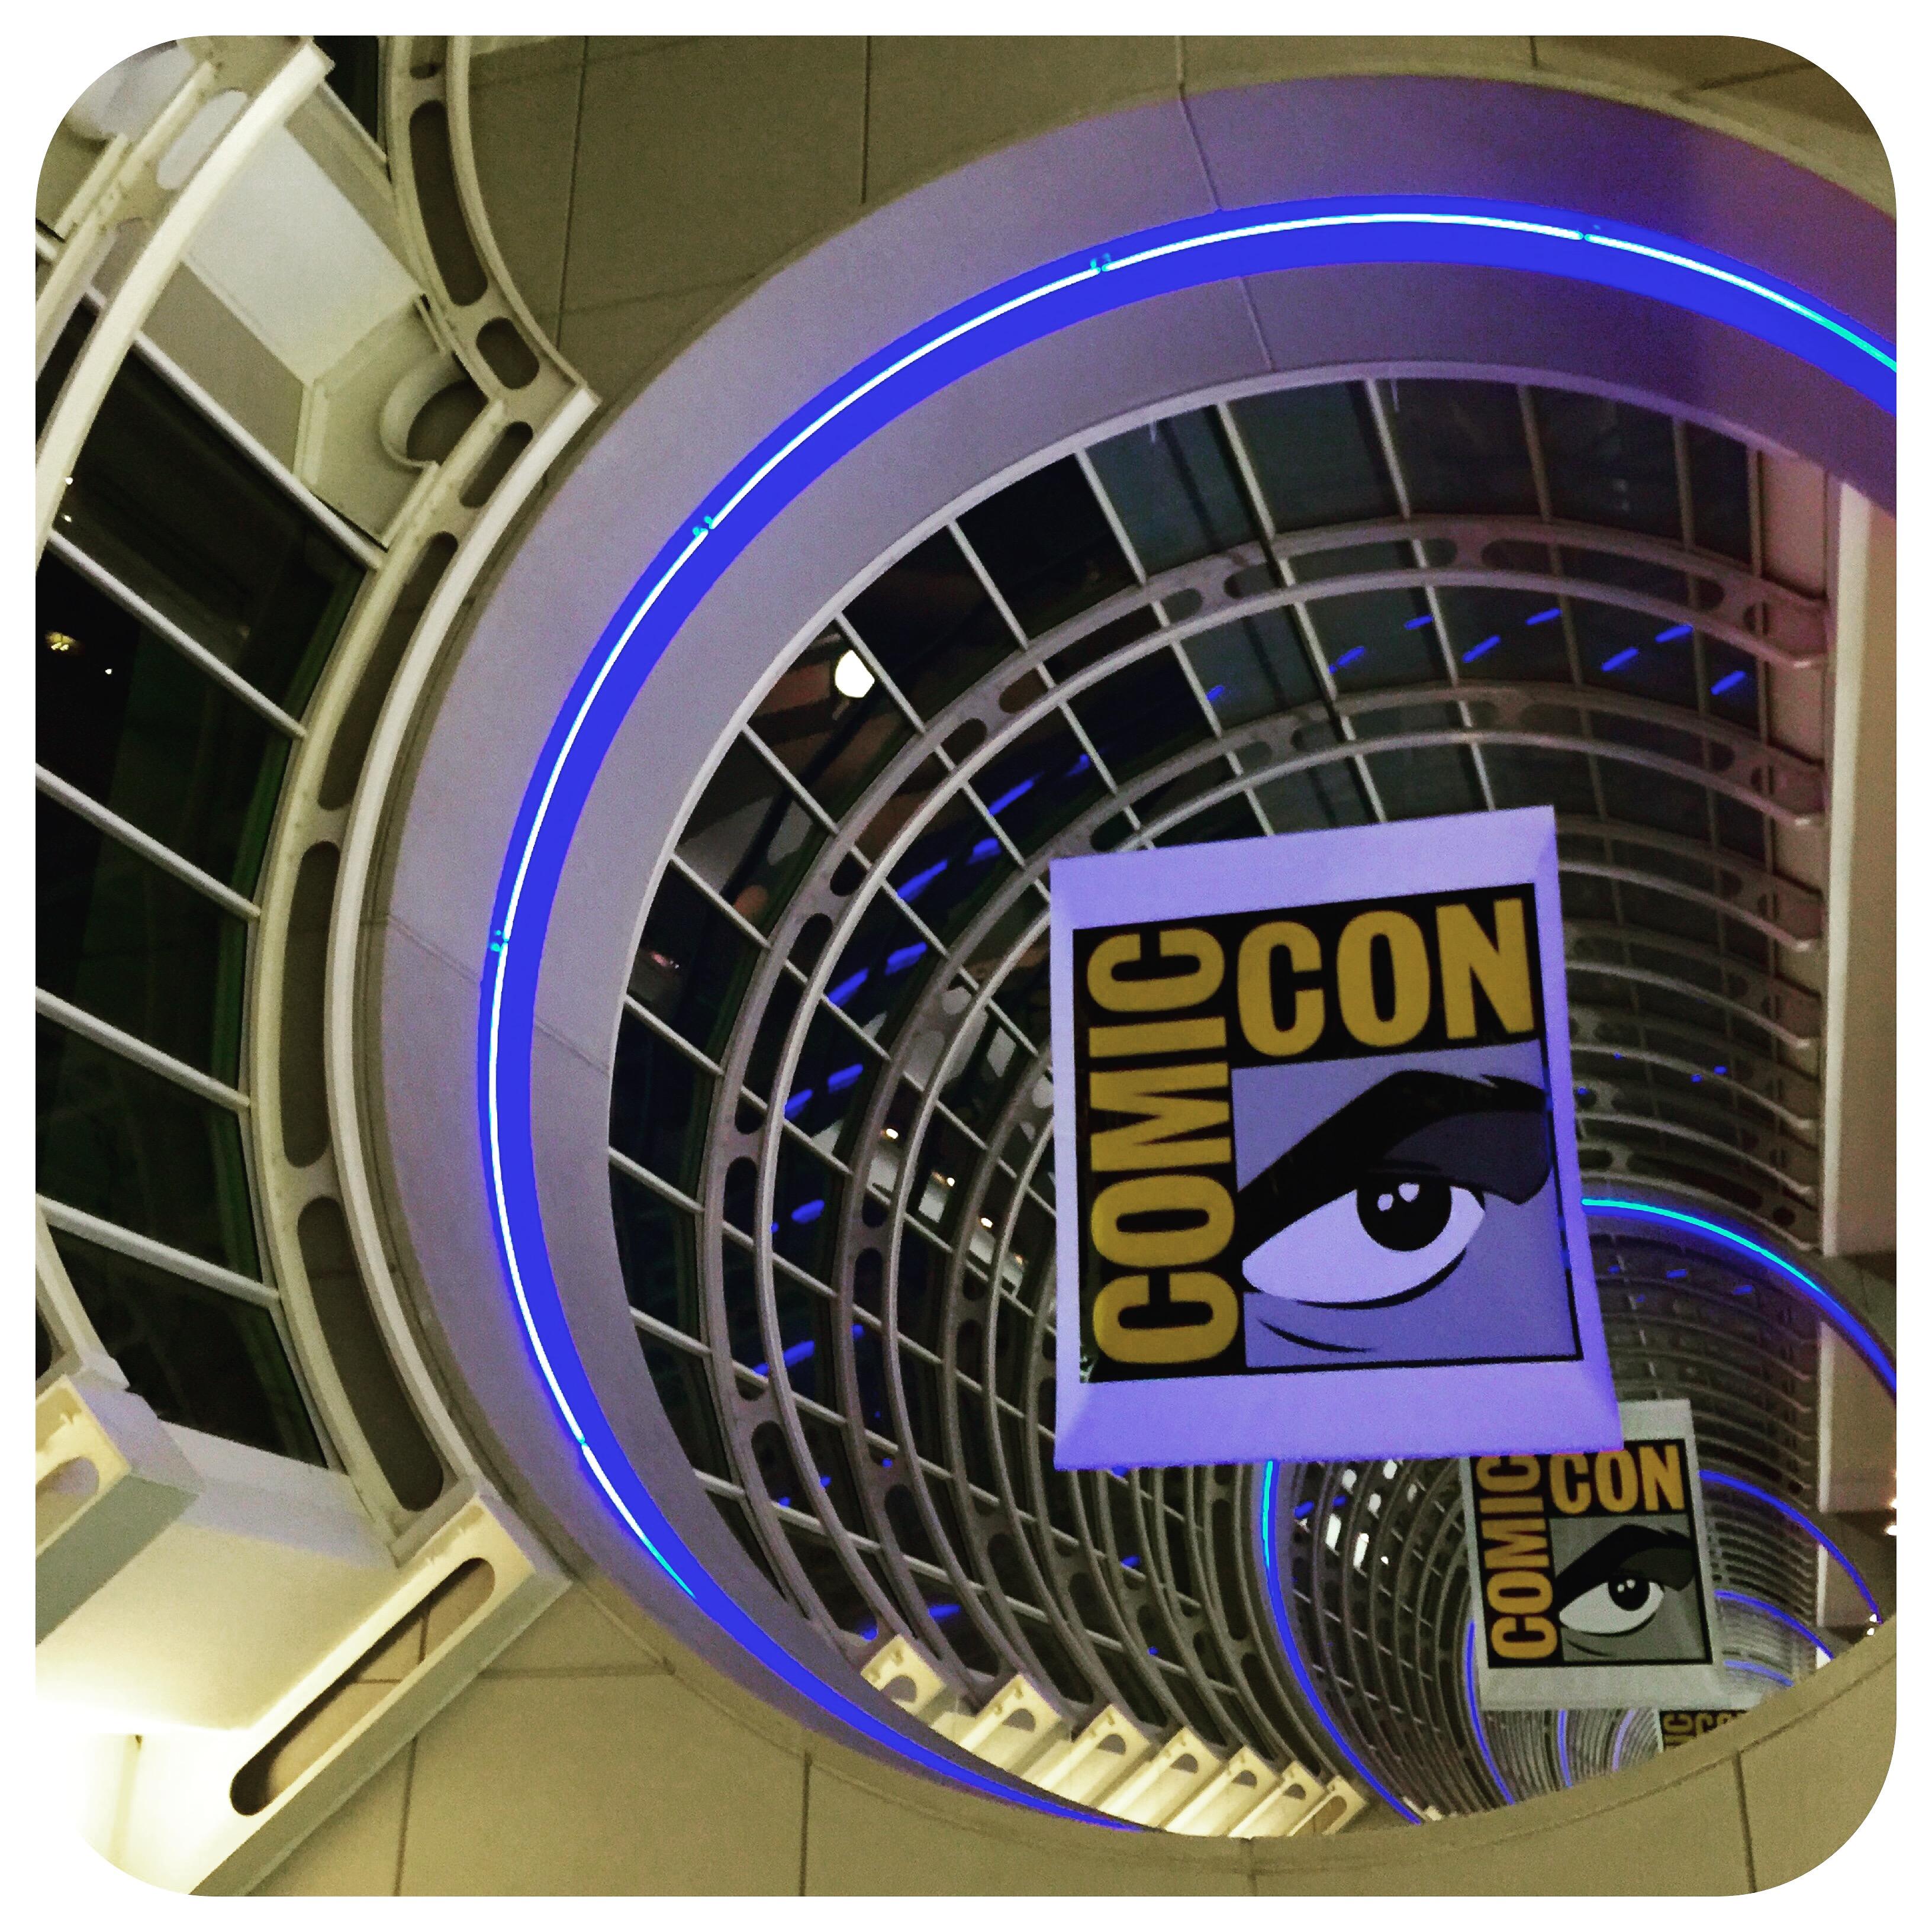 [Evento][Tópico Oficial] Comic-Con San Diego 2015 - Cobertura e itens exclusivos! - Página 4 IXYETT